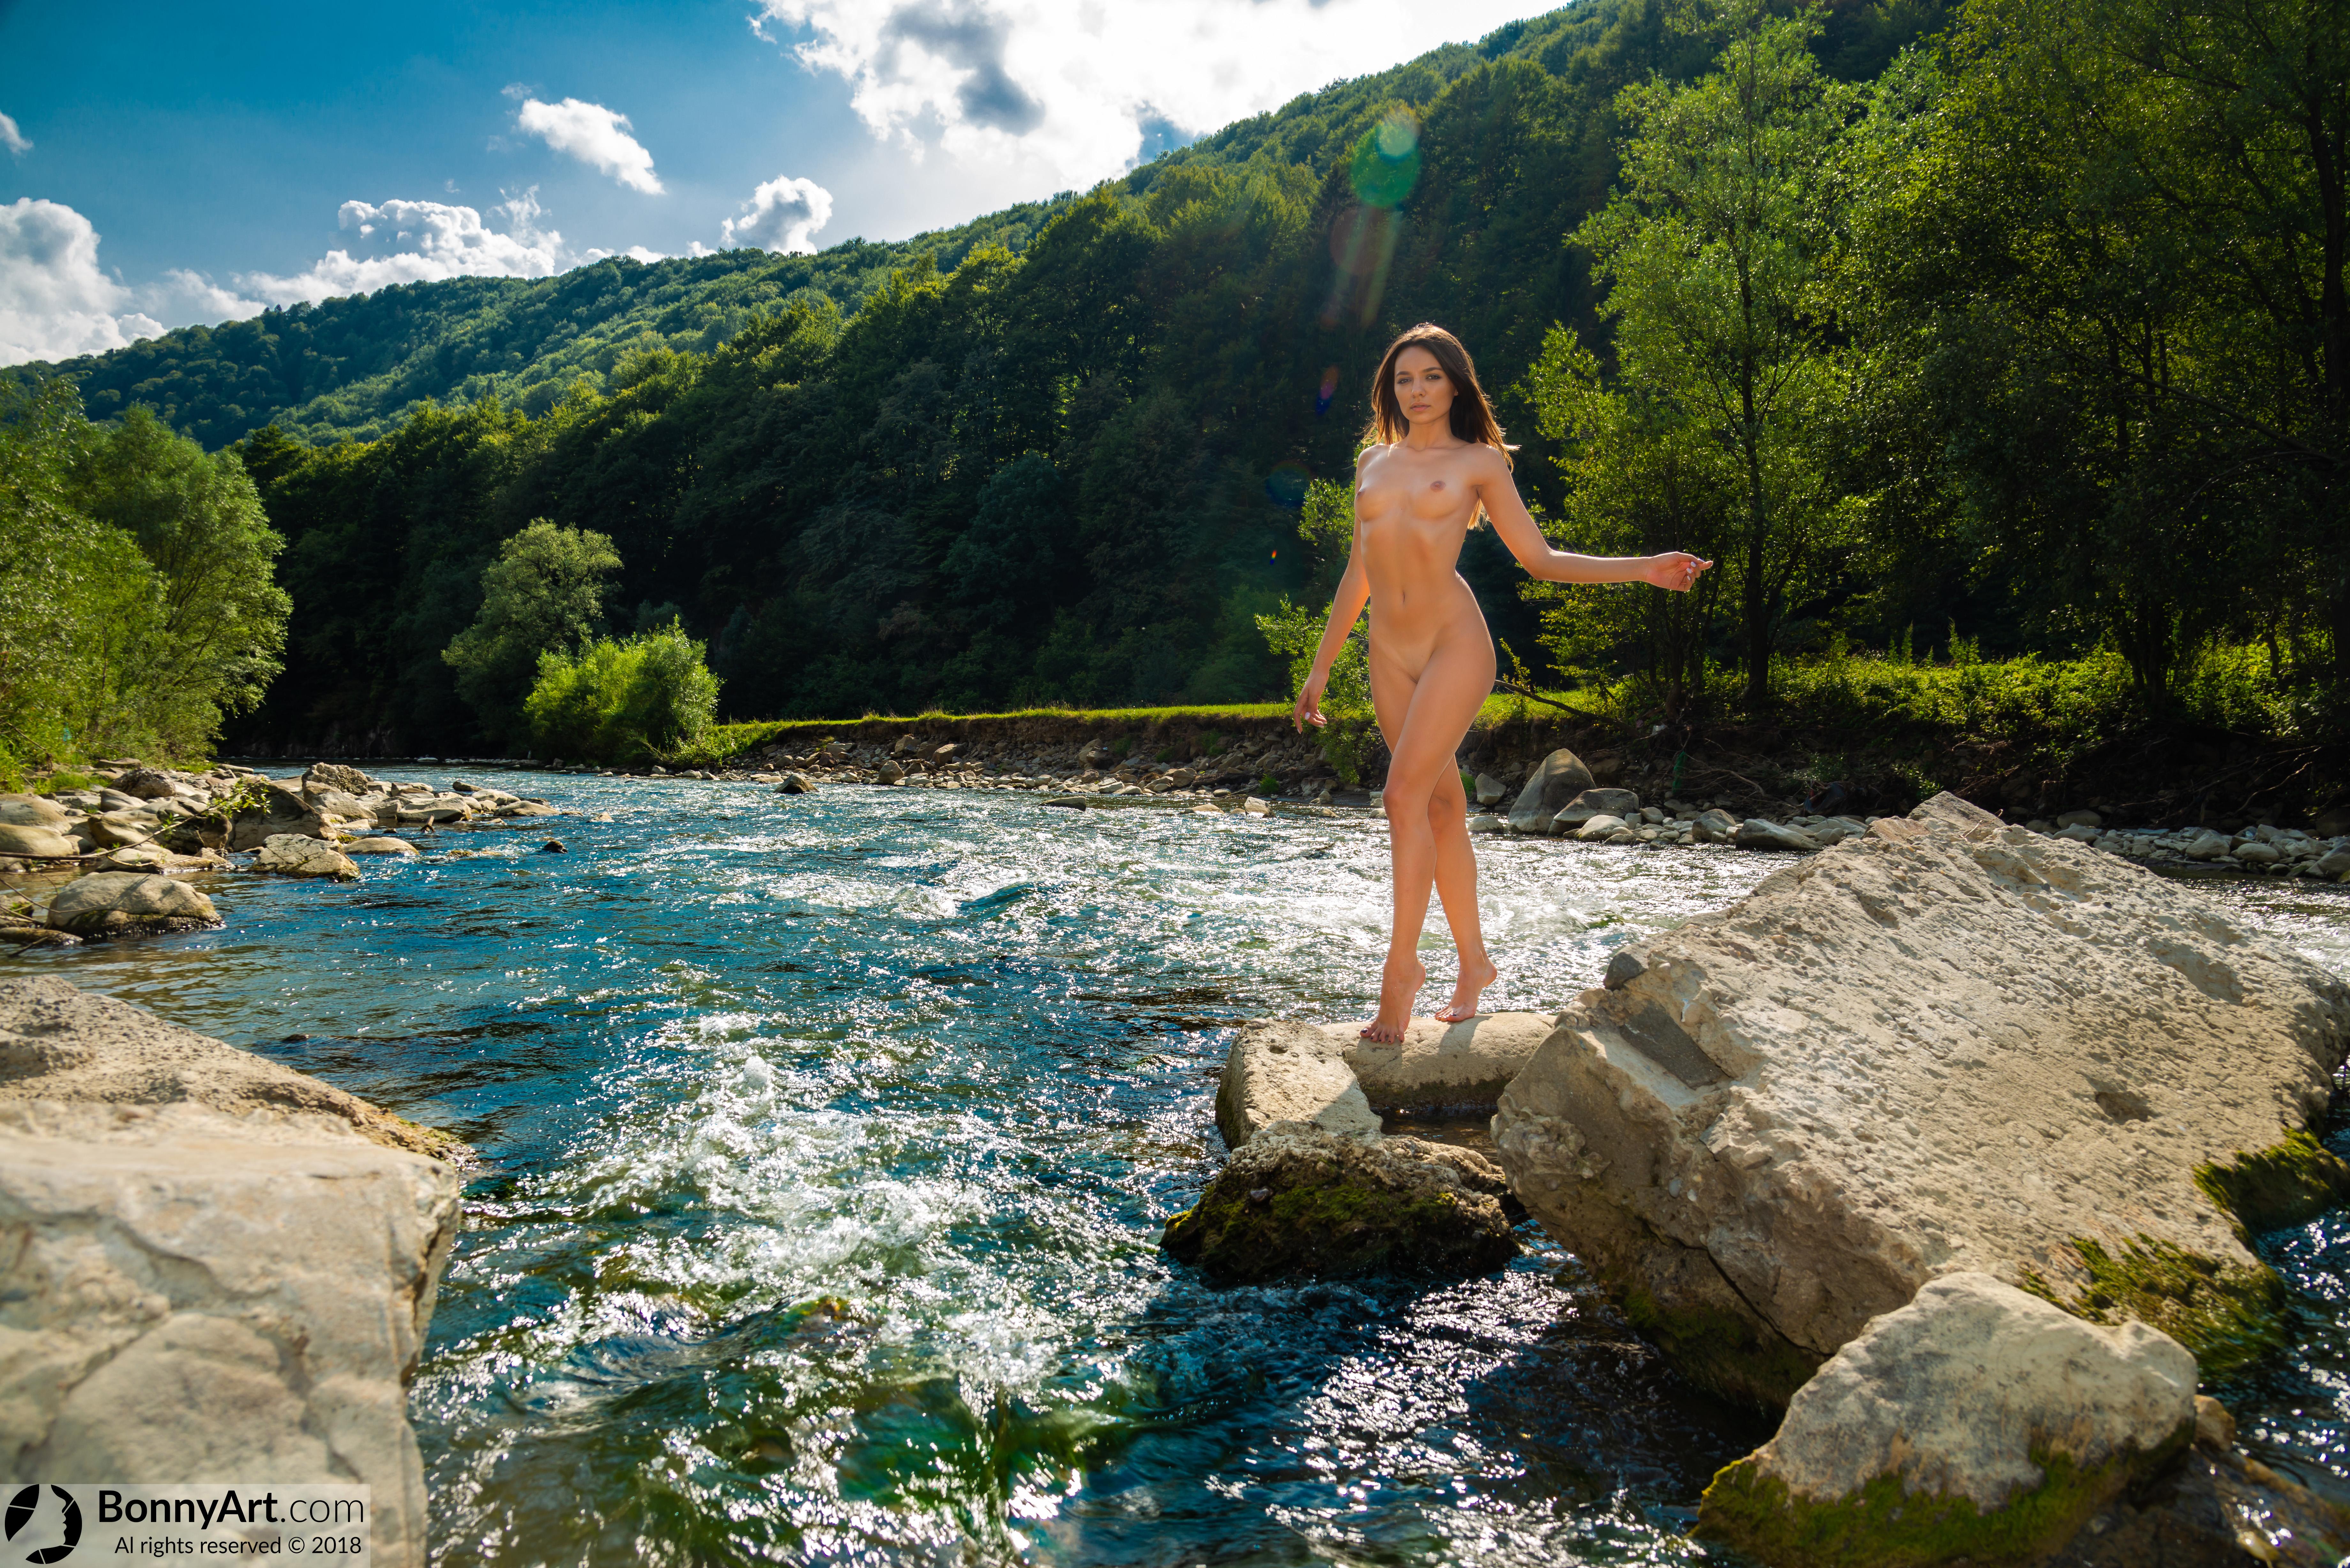 Nudist Beautiful Model Walking on River HD